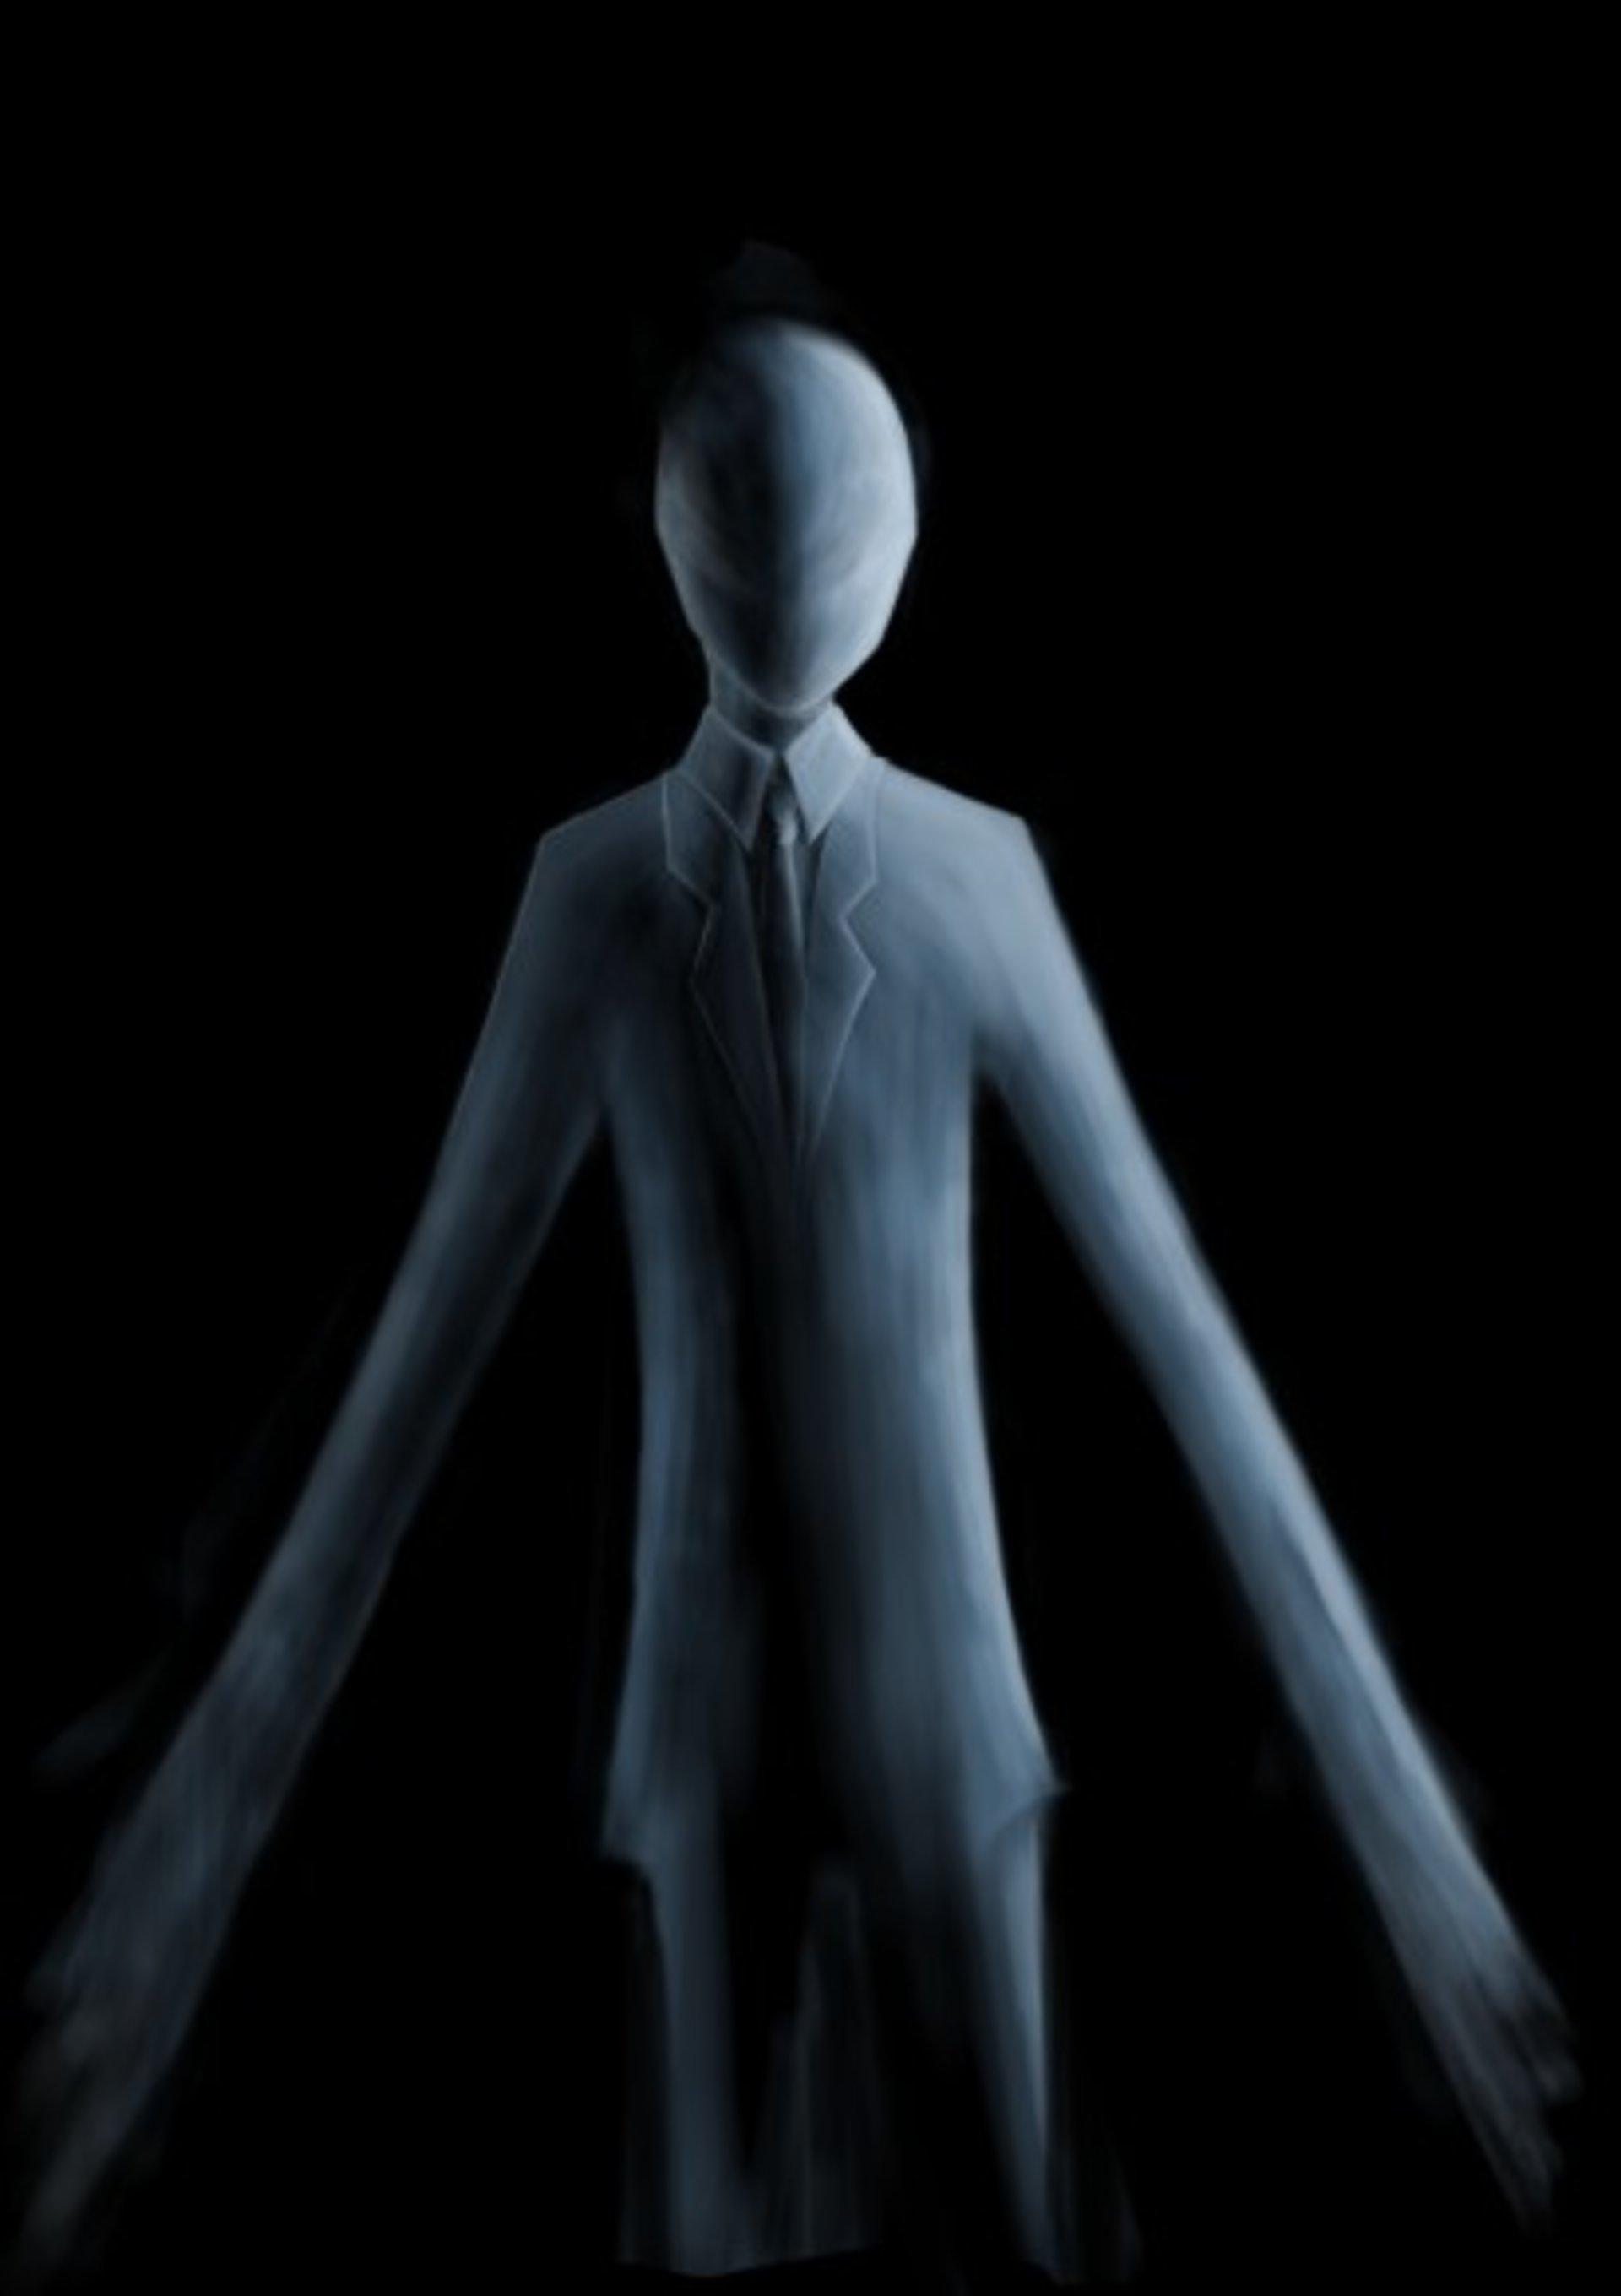 Slender Man (disambiguation)